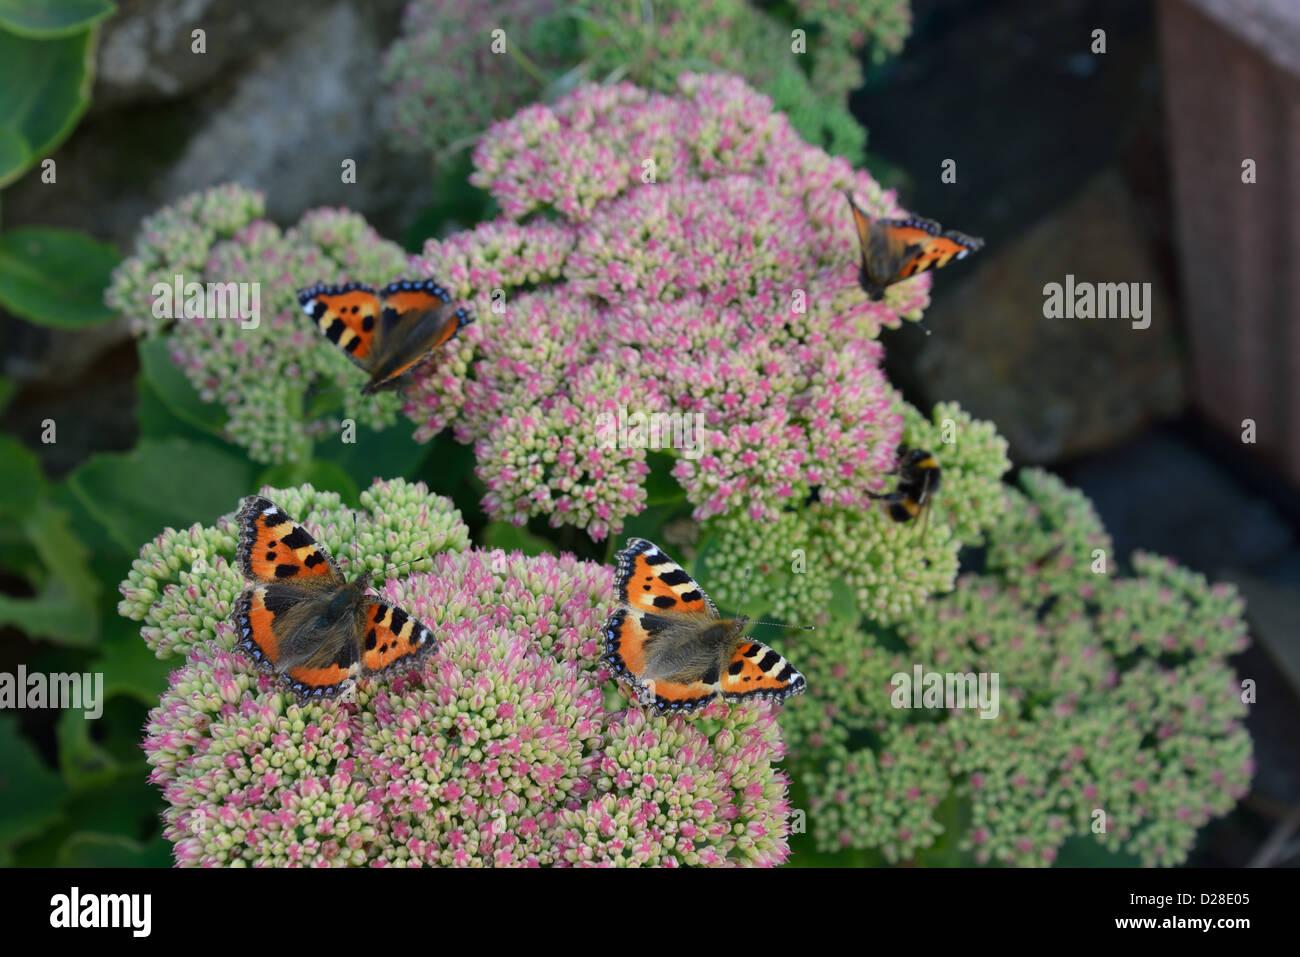 4 Small tortoiseshell butterflies on summer flowers - Stock Image